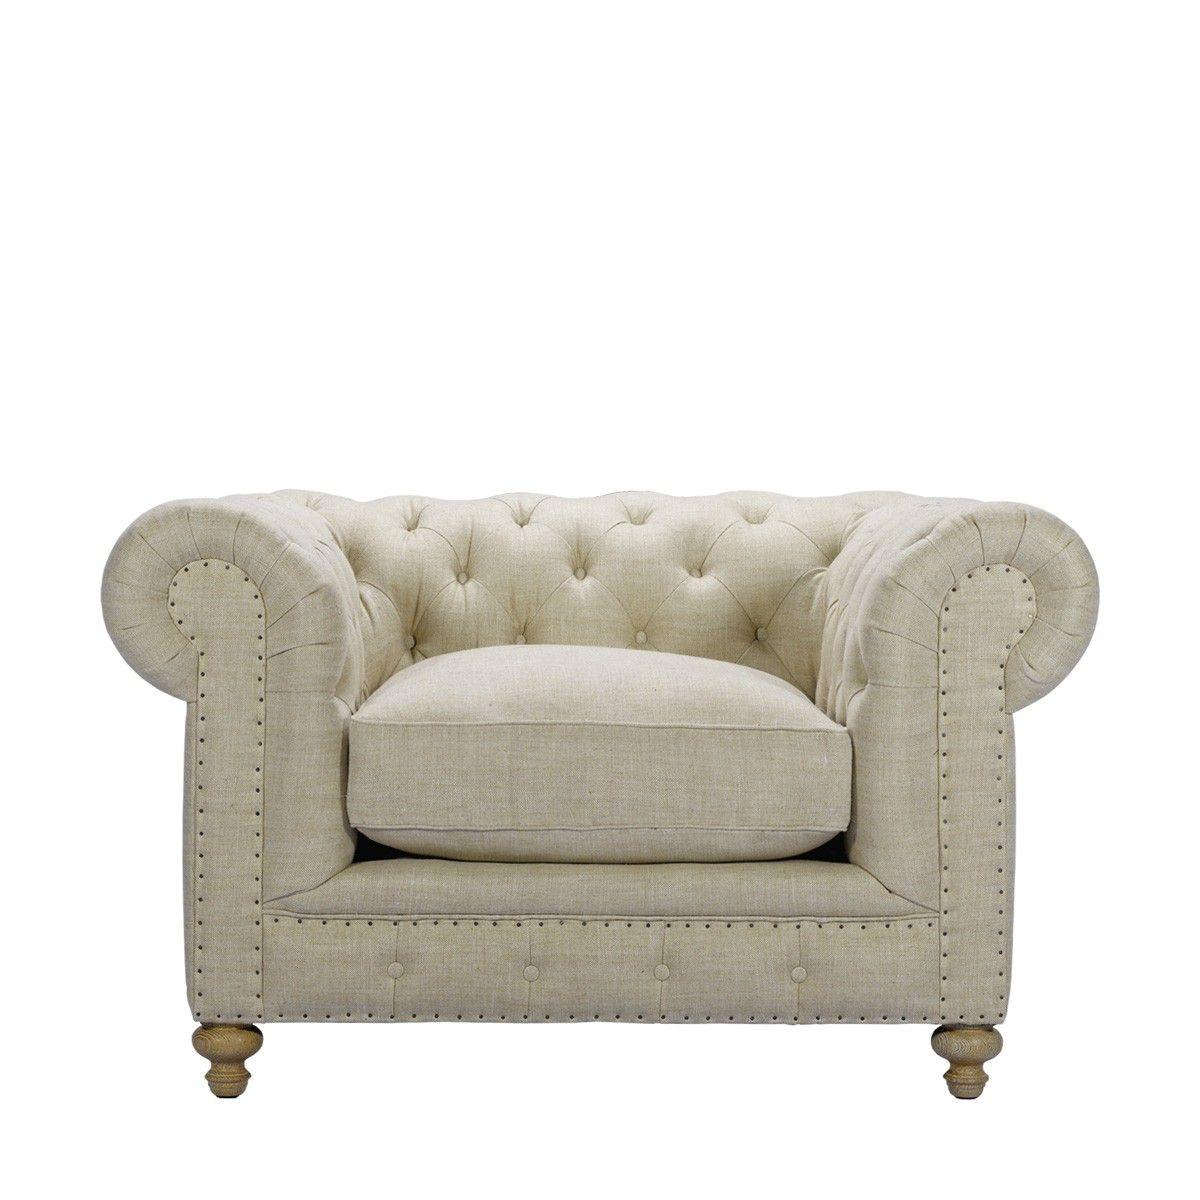 Beau Curations Limited Cigar Club Arm Chair 7841.0001.A015